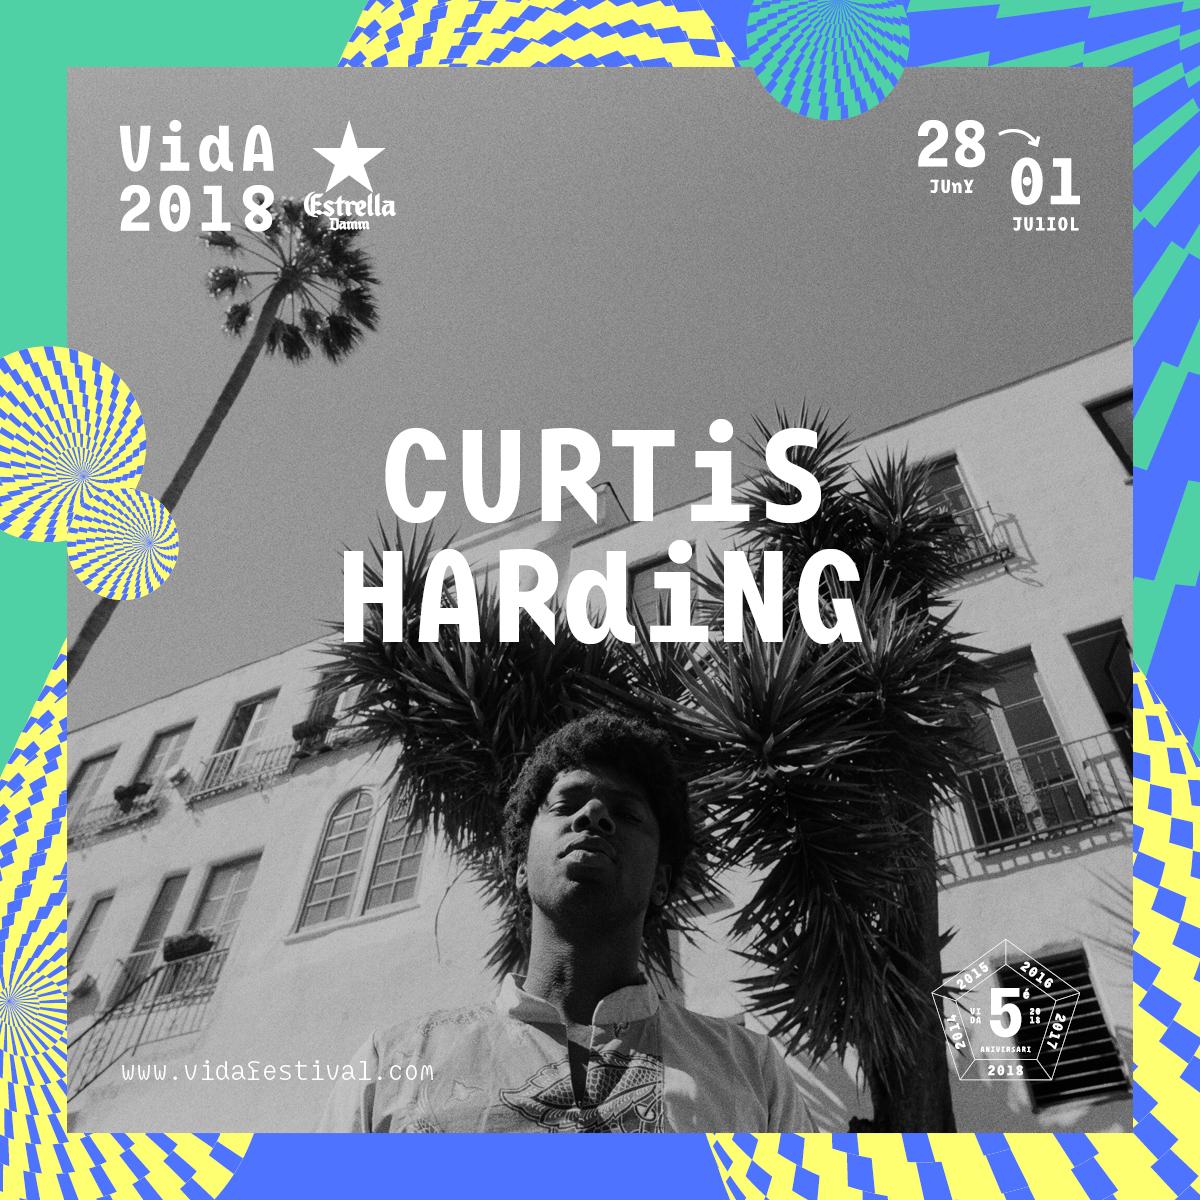 Curts Harding 1200x1200.jpg